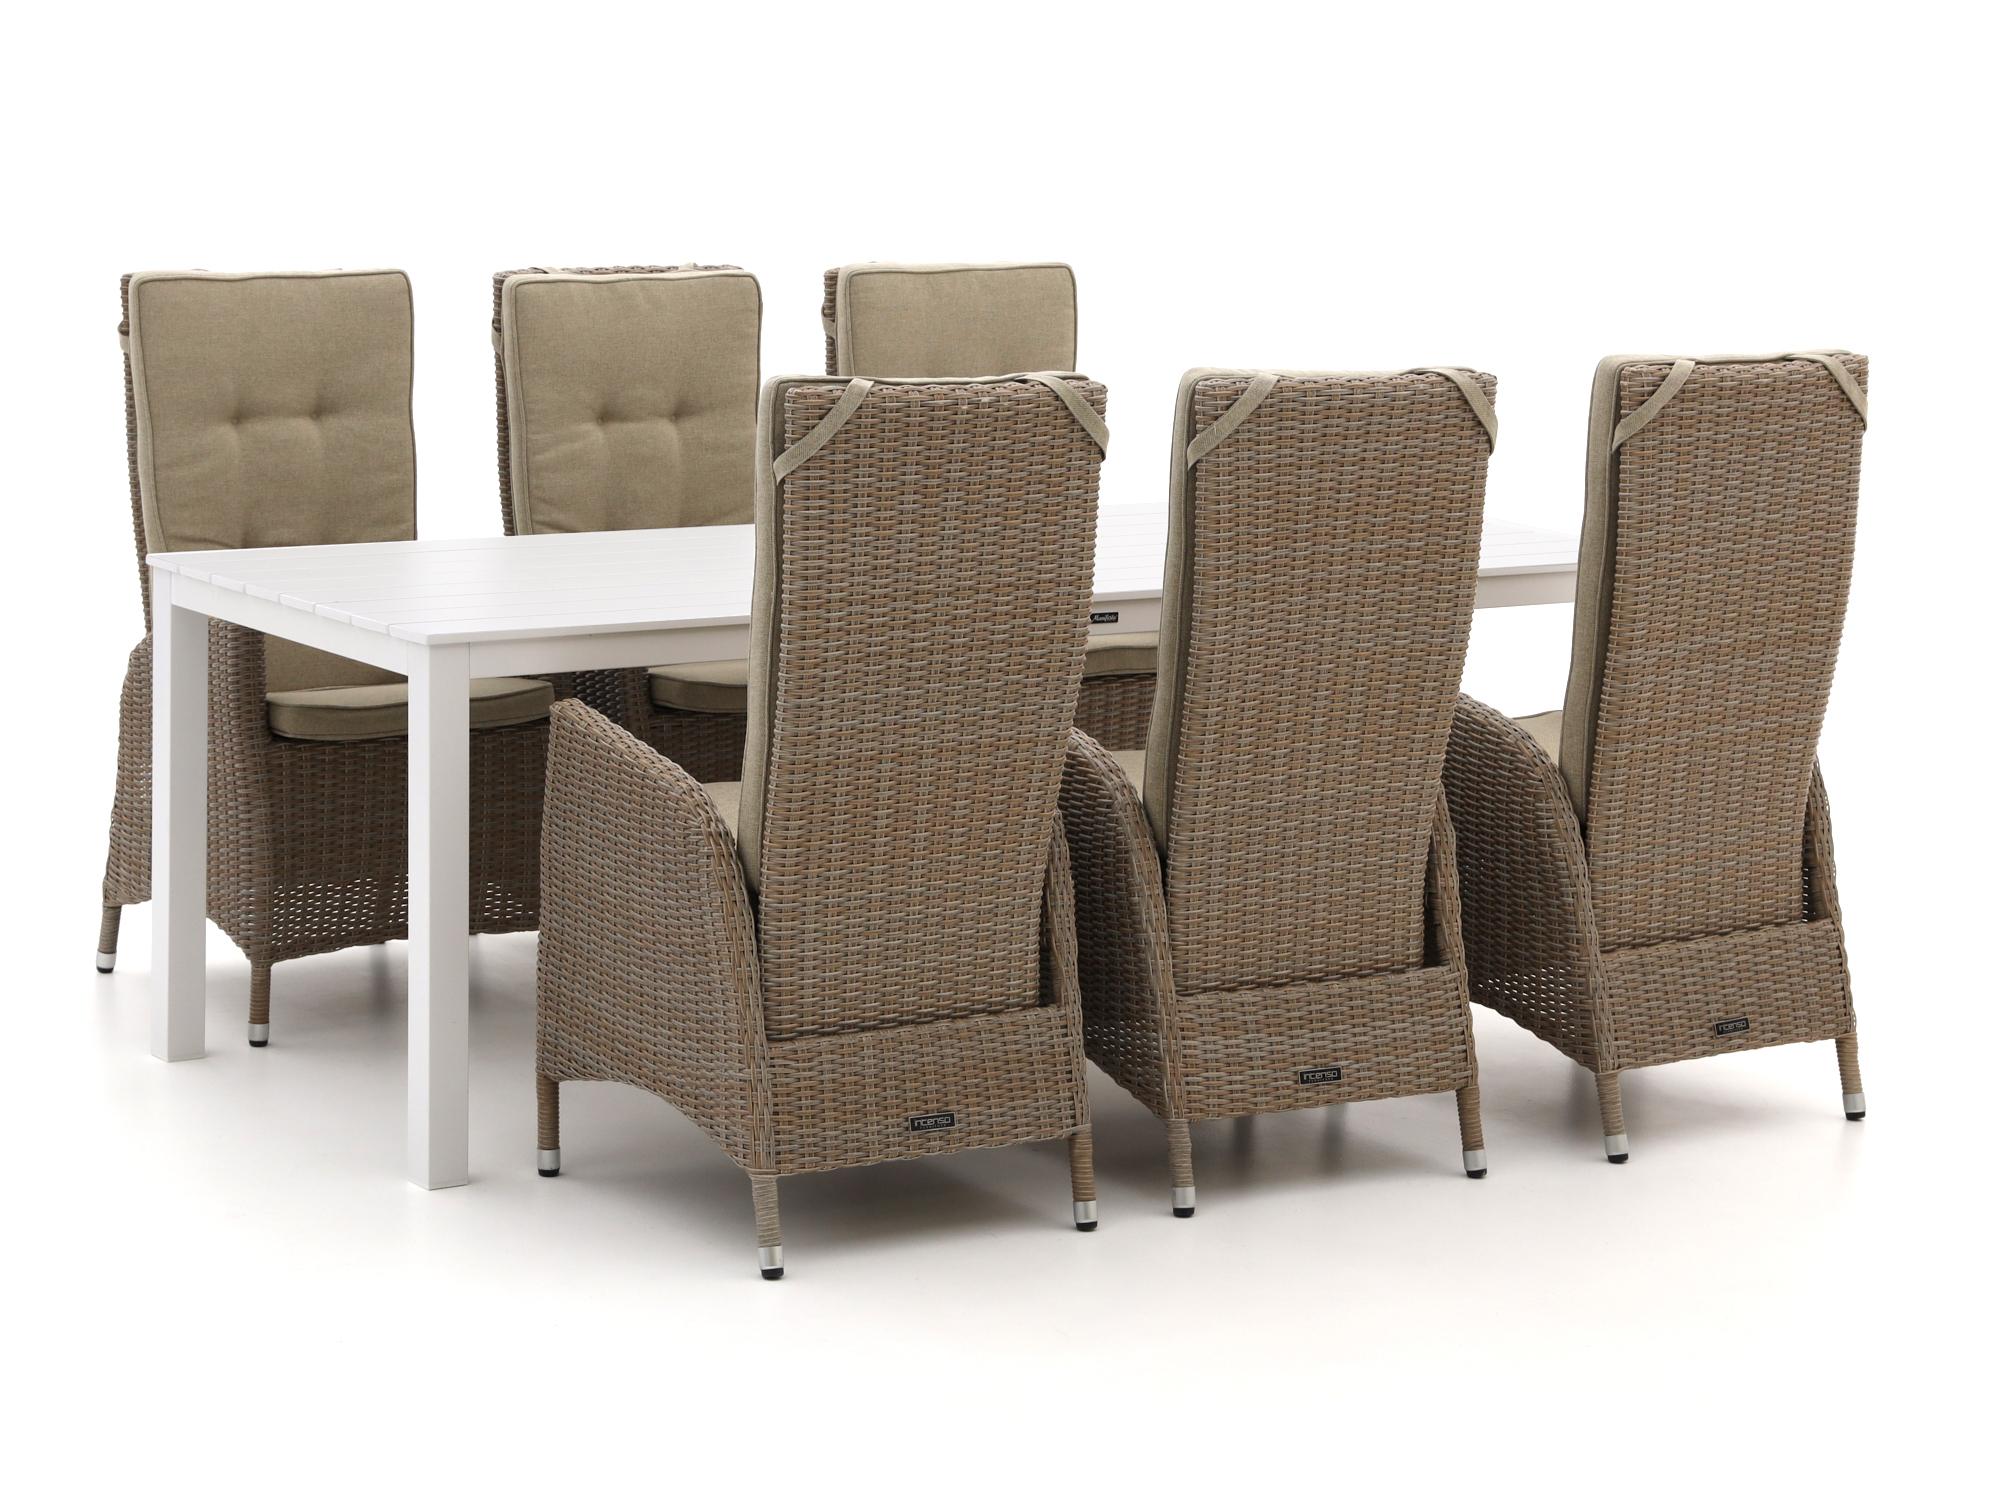 Intenso Fabrizi/Menzano 220cm dining tuinset 7-delig verstelbaar - Laagste prijsgarantie!